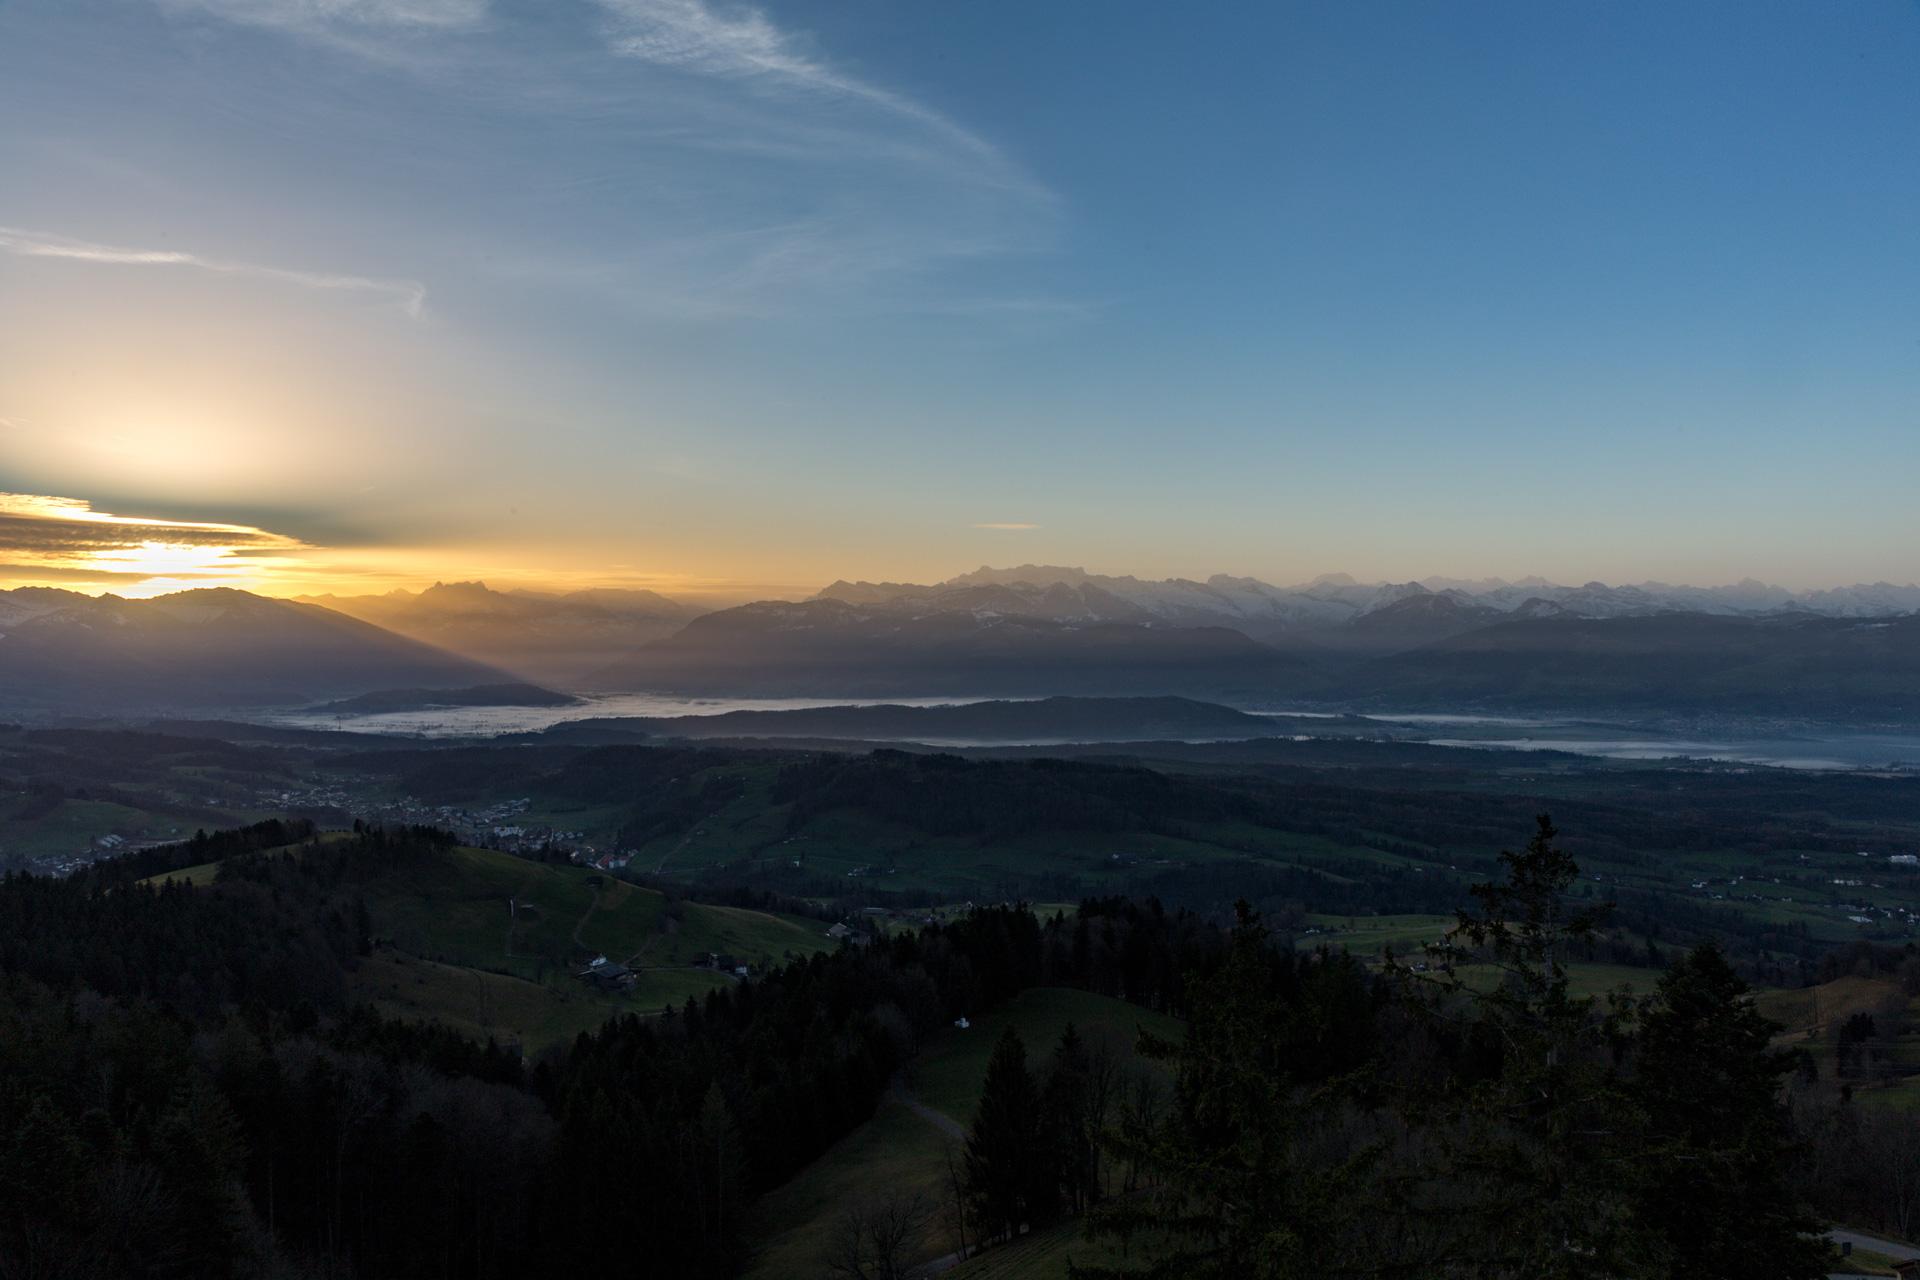 Sonnenaufgang-Bachtelturm_20151219_5976-1ebene